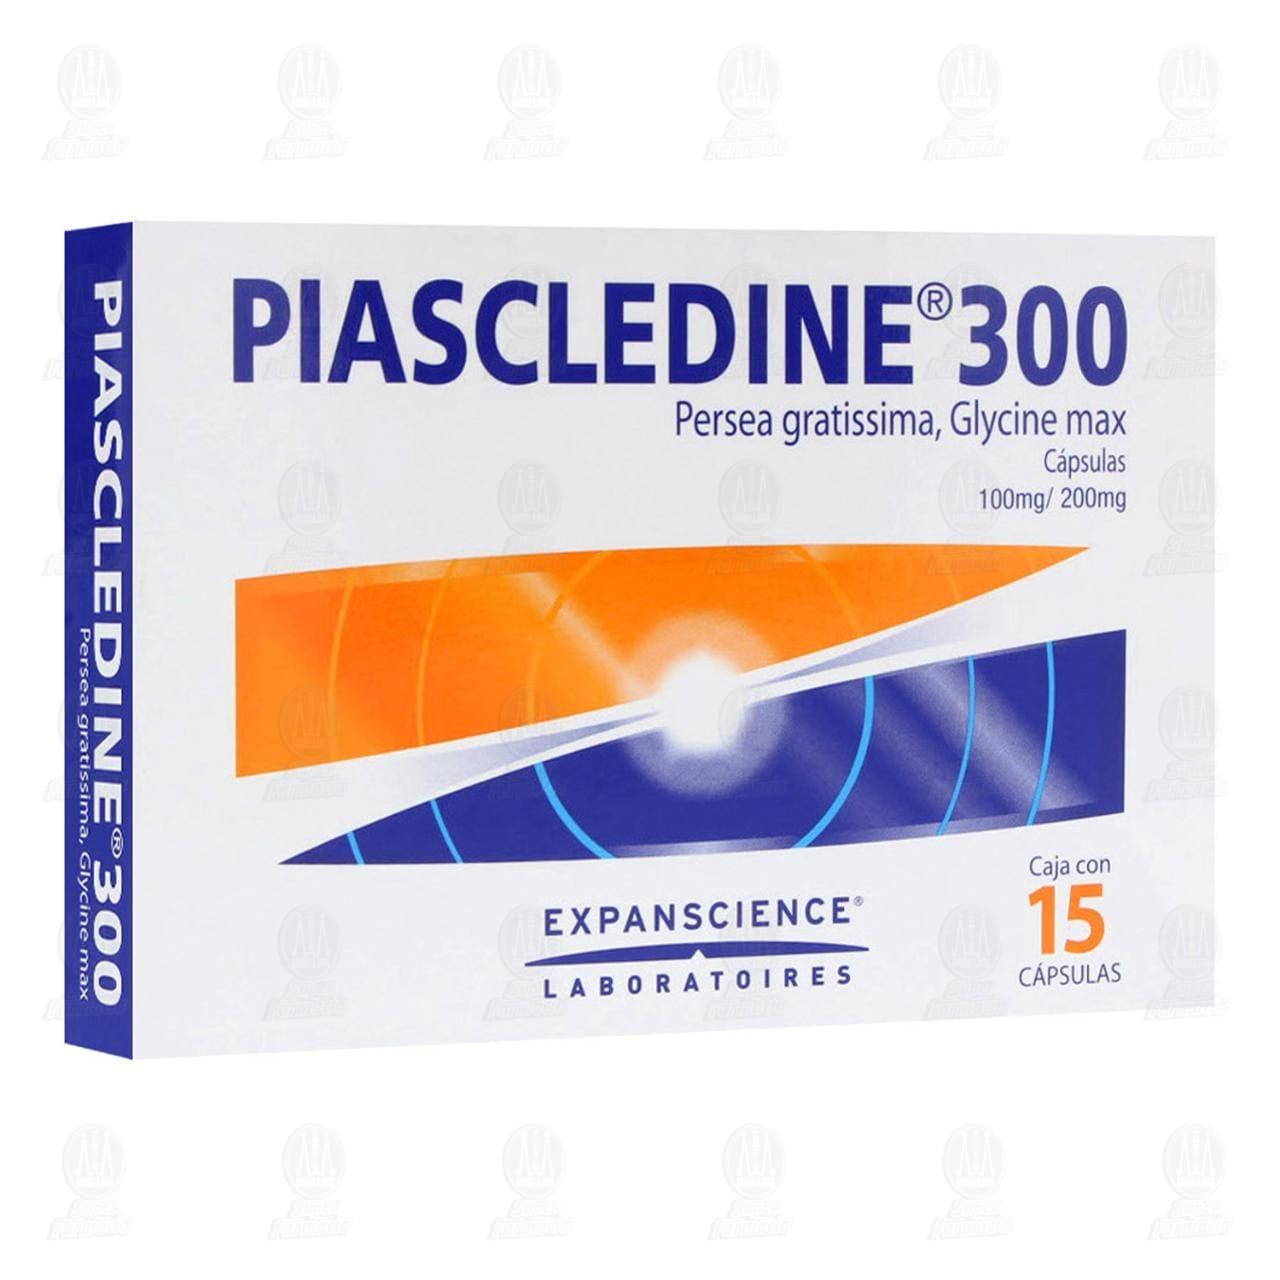 Comprar Piascledine 300 100mg/200mg 15 Cápsulas en Farmacias Guadalajara